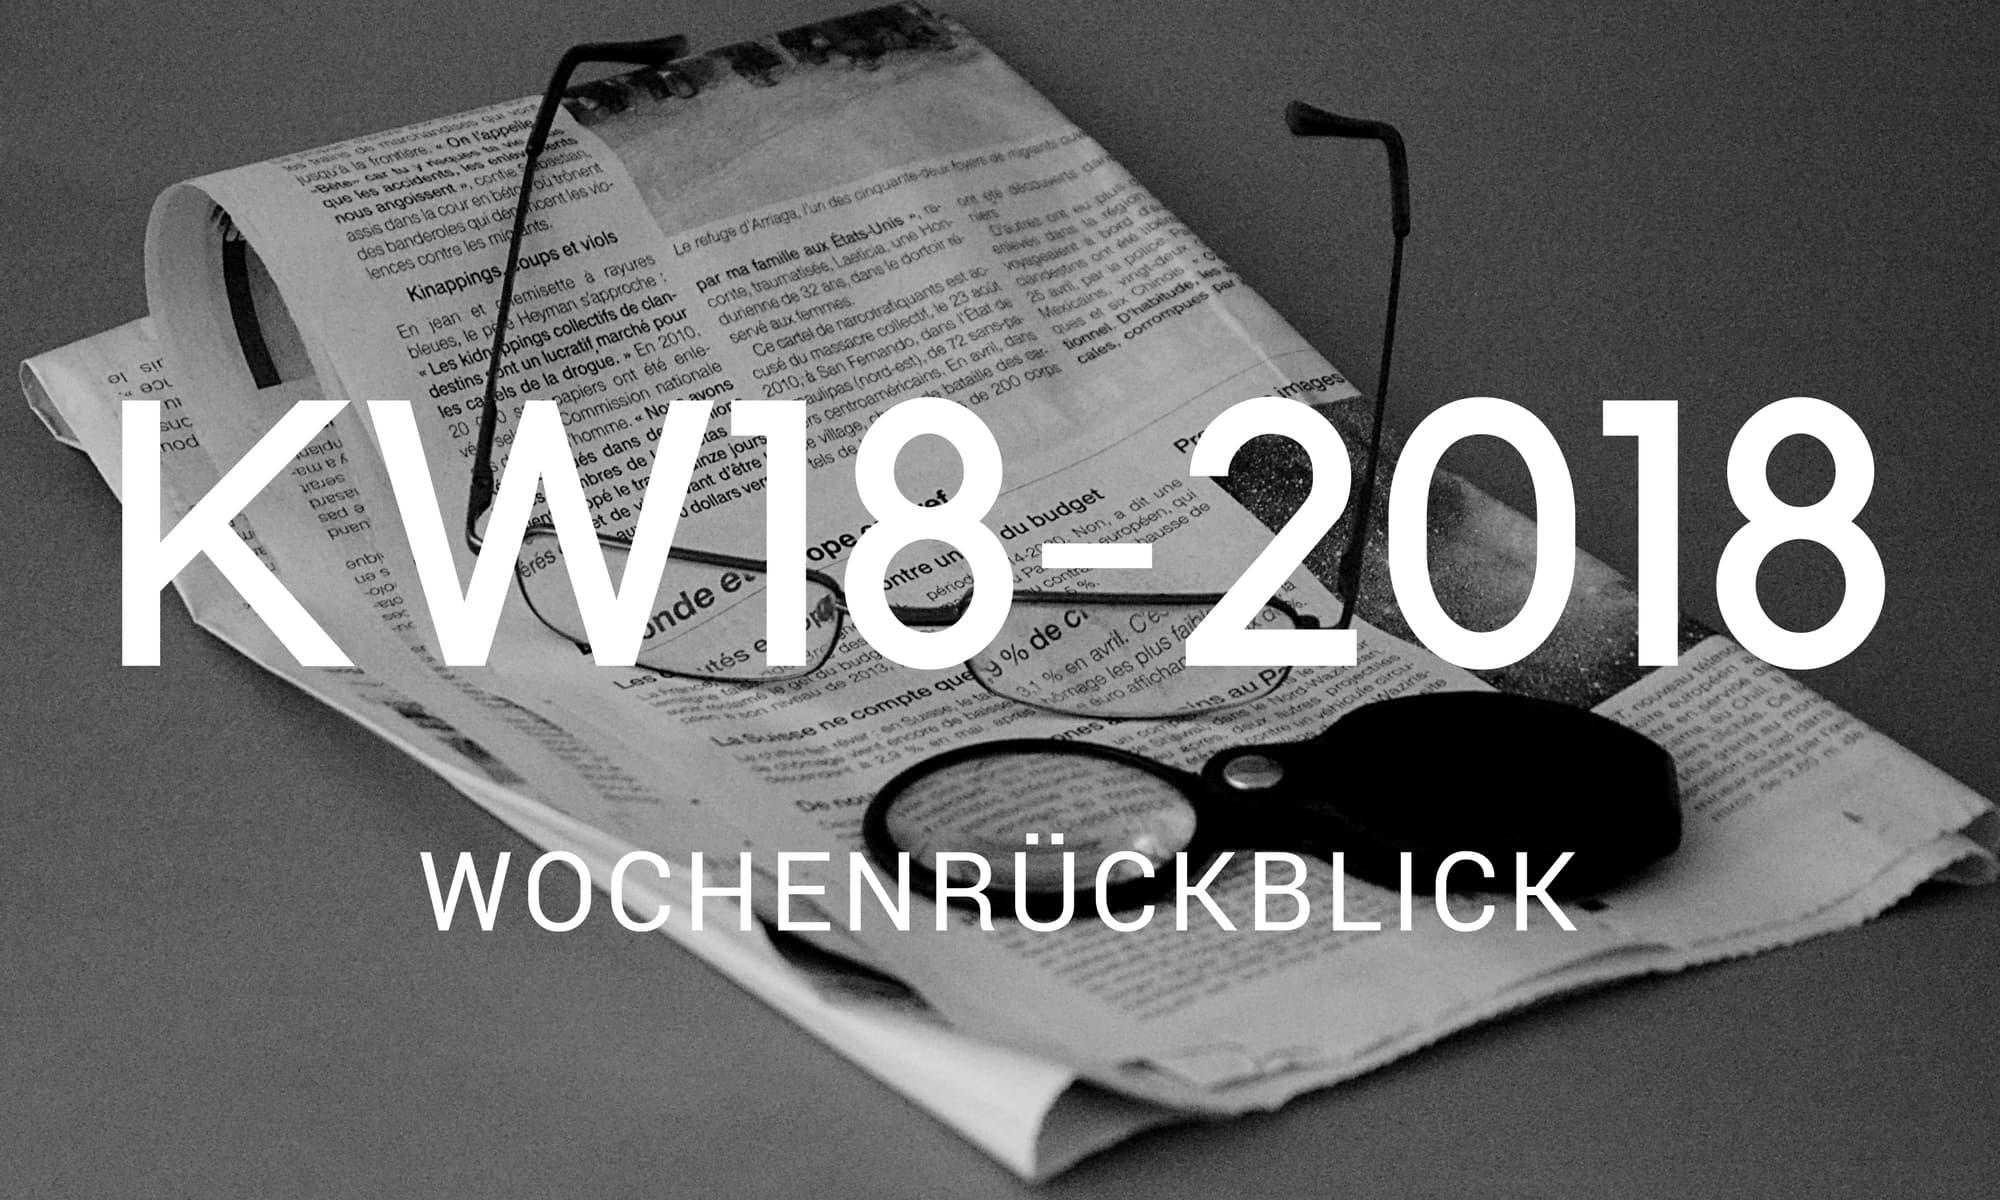 wochenrueckblick camping news KW18 2018